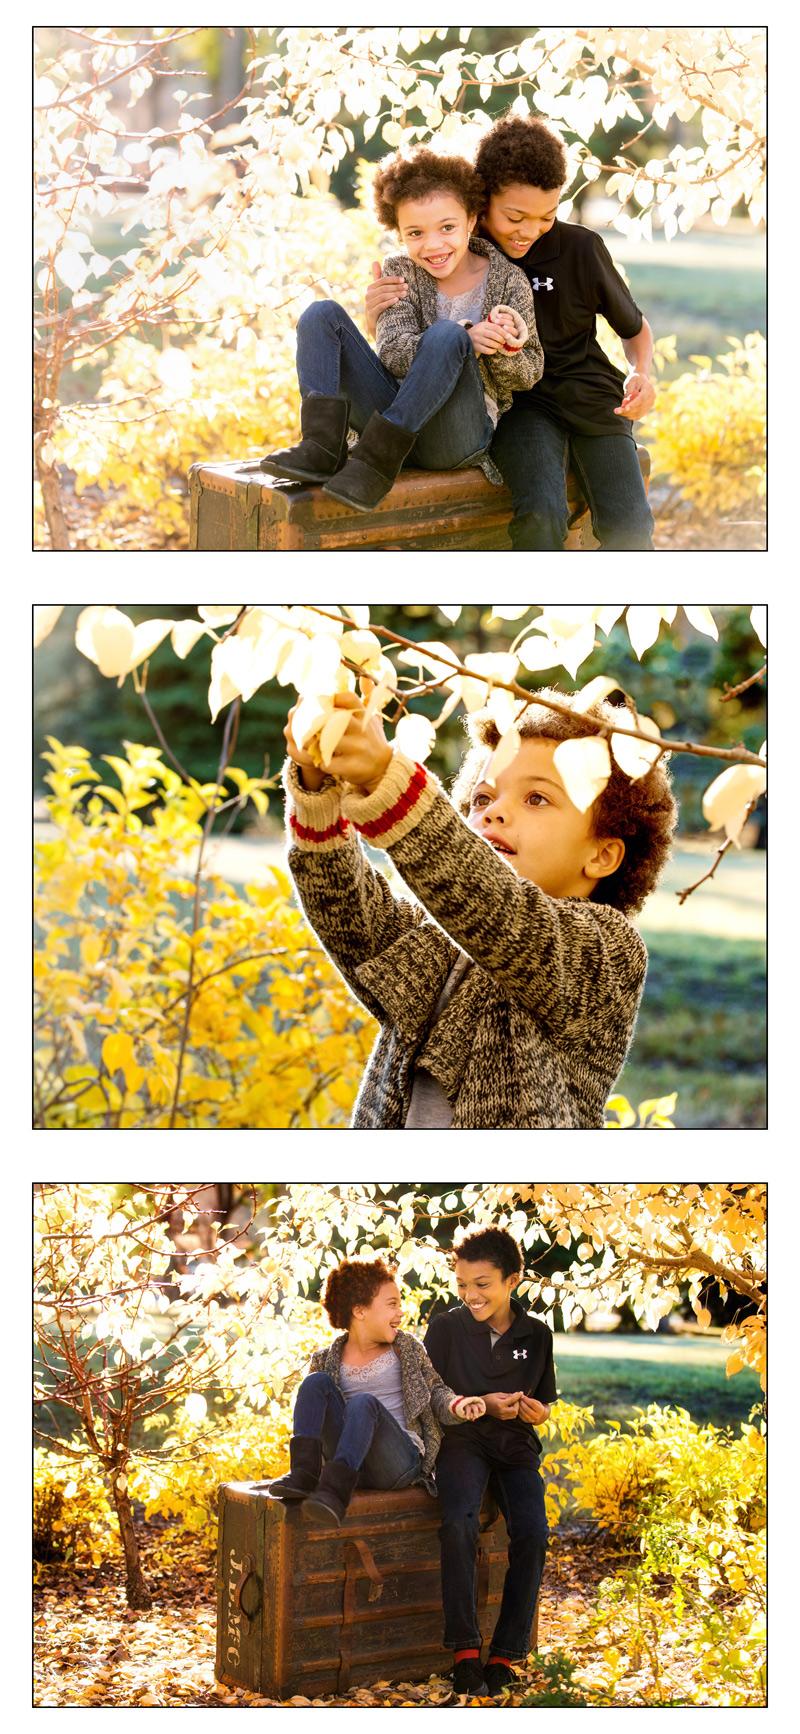 loving-family-free-lesnse-photo-02.jpg